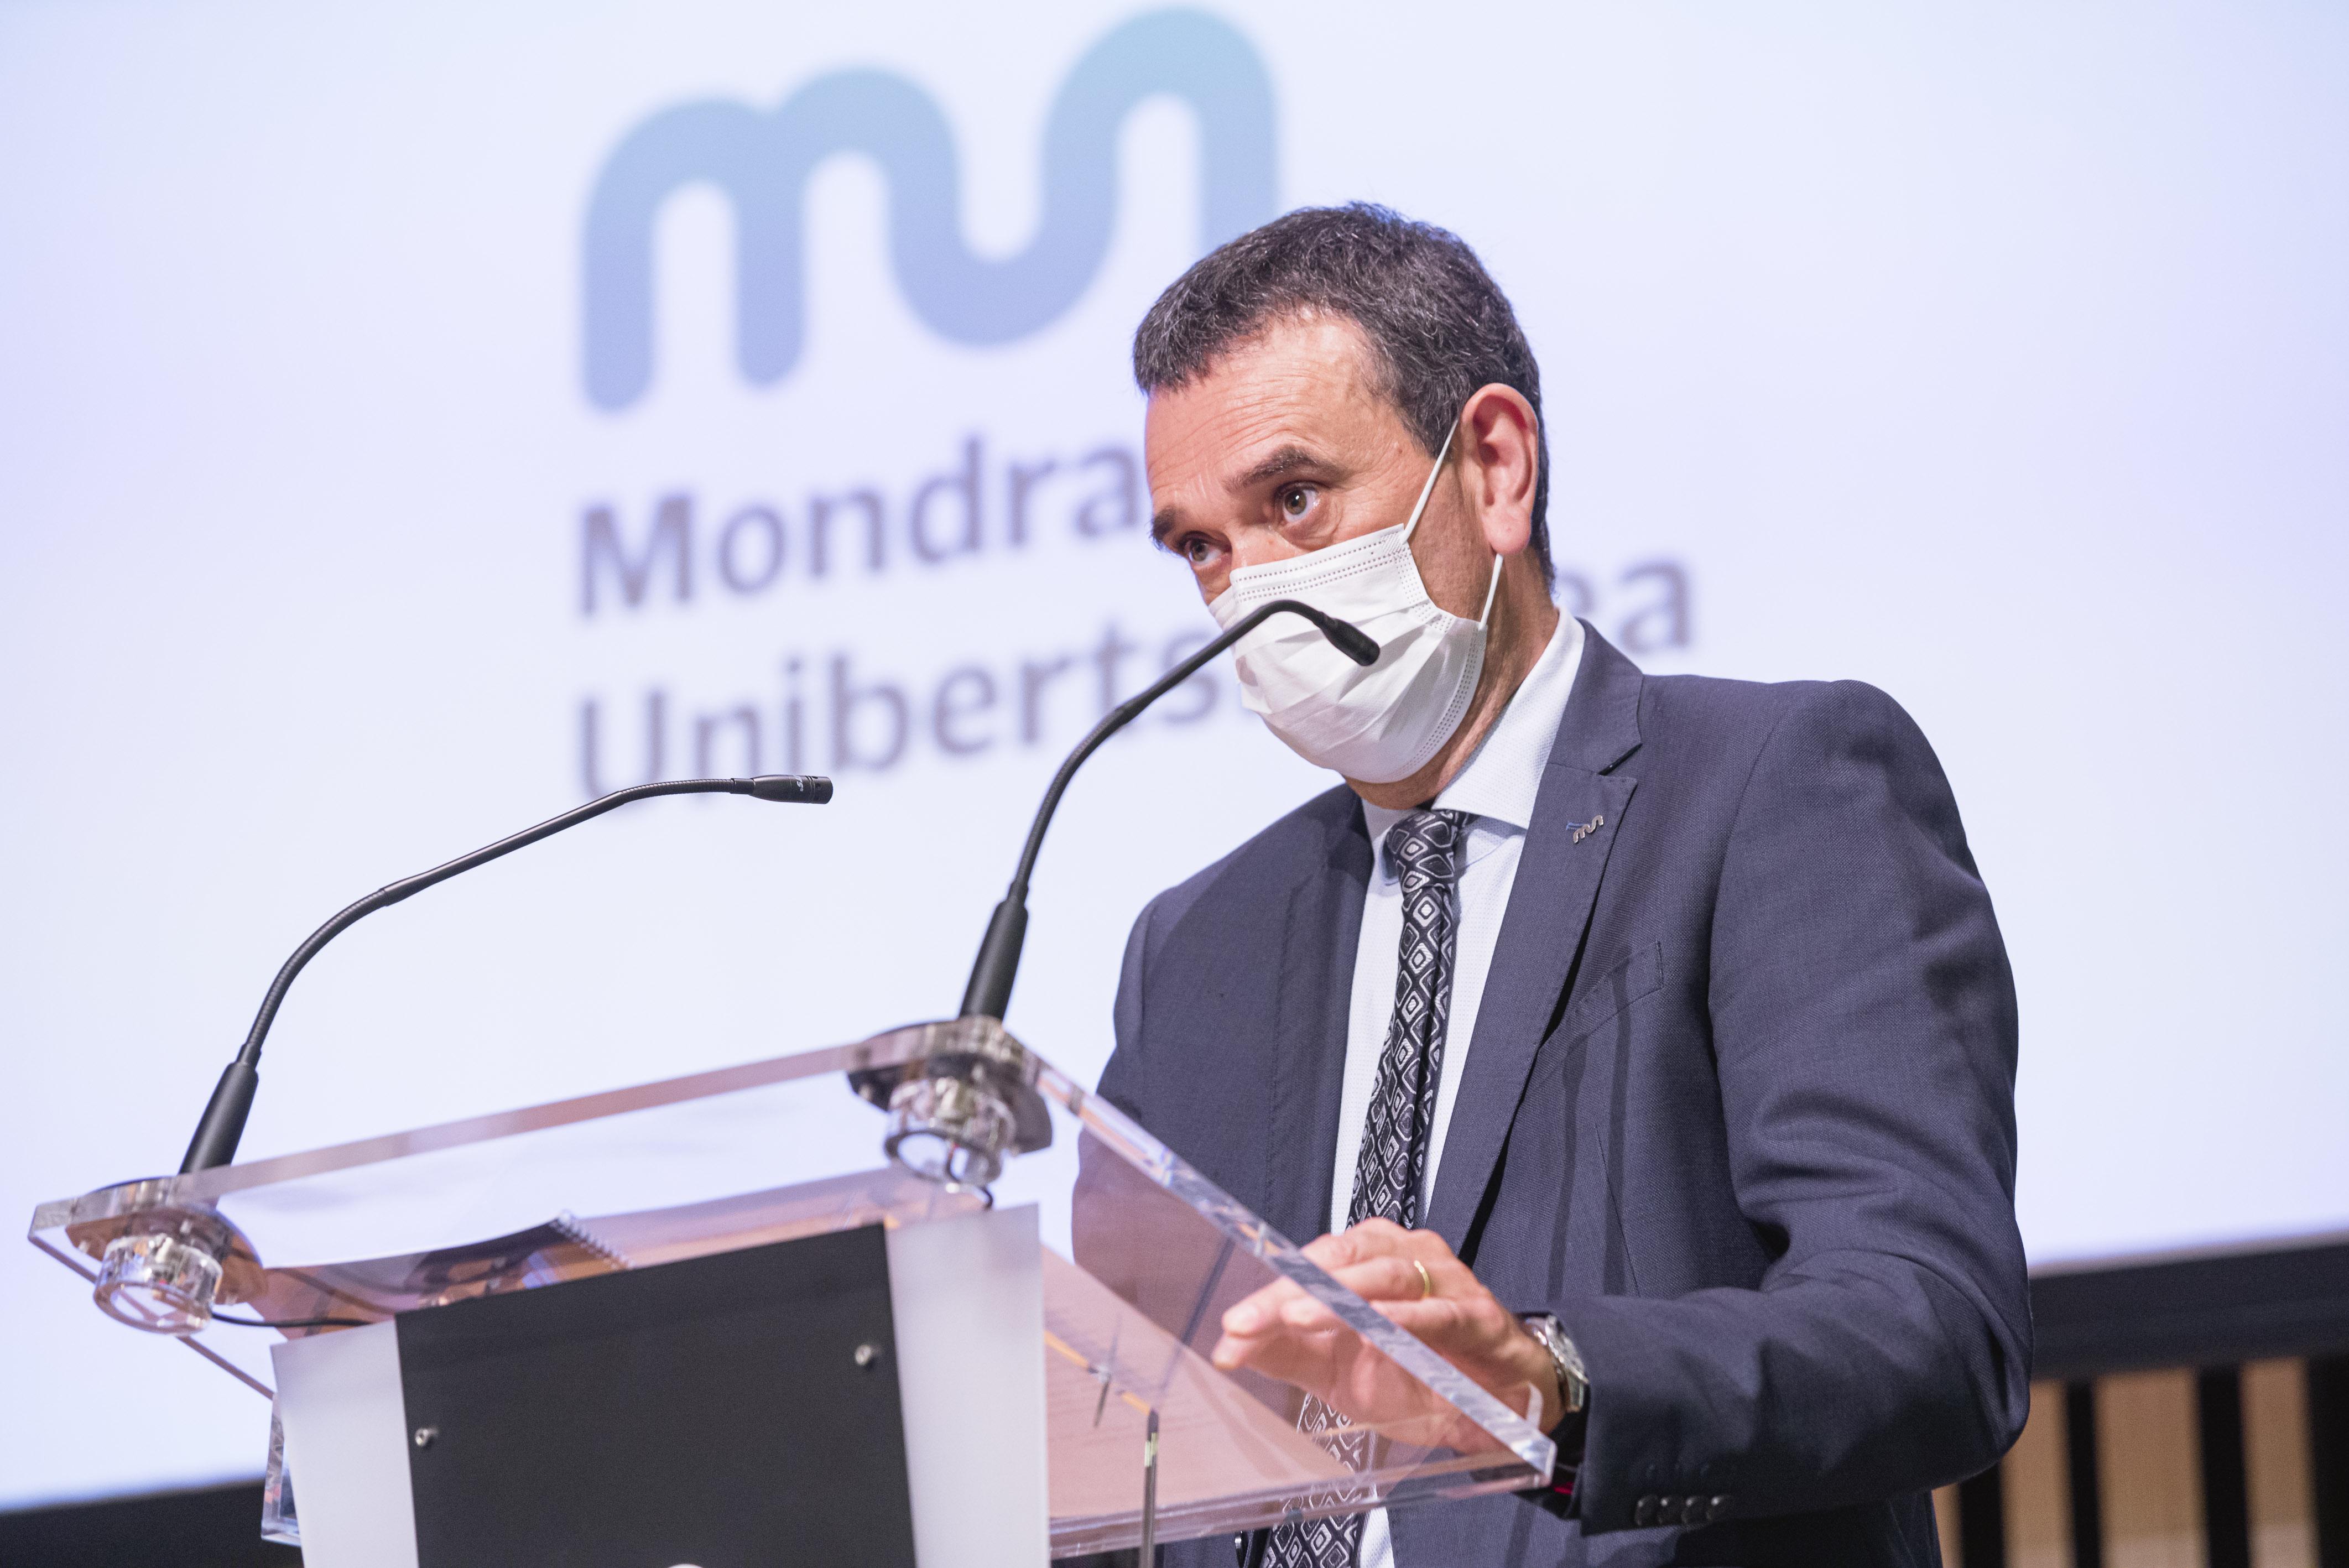 Mondragon_uni_donostia17-9-2021_usual-9814.jpg